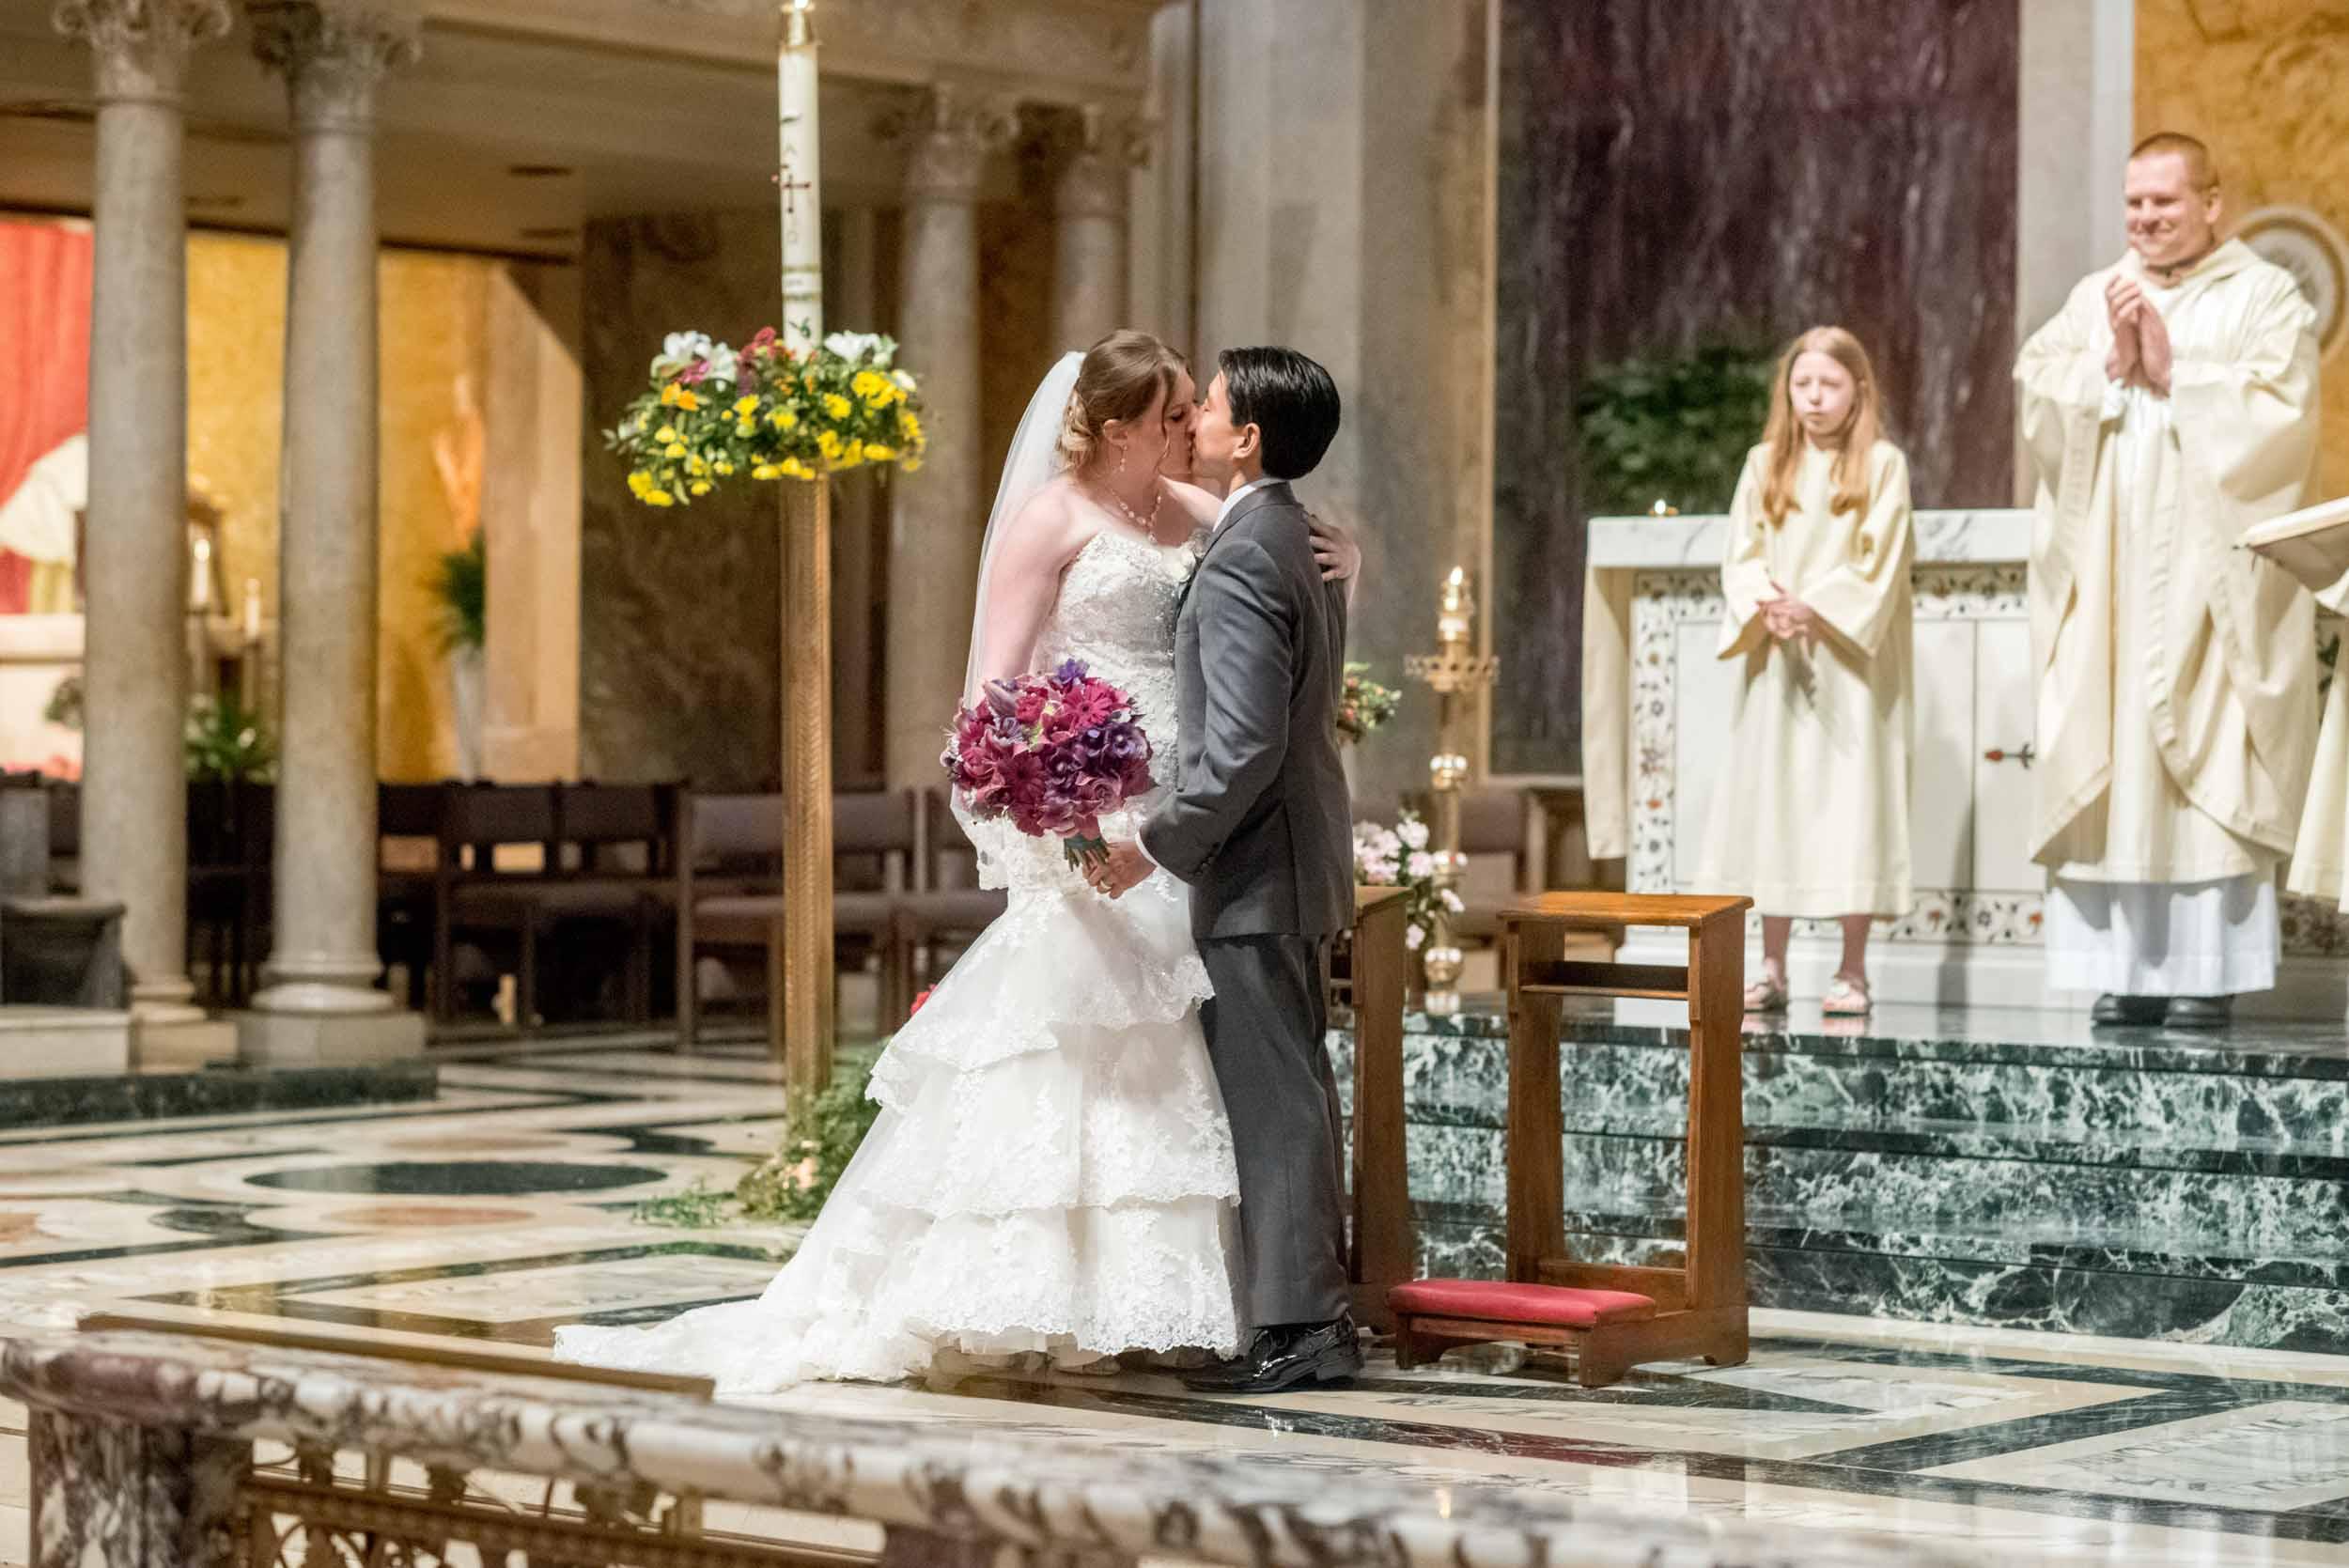 dc+metro+wedding+photographer+vadym+guliuk+photography+wedding+first+kiss-2022.jpg